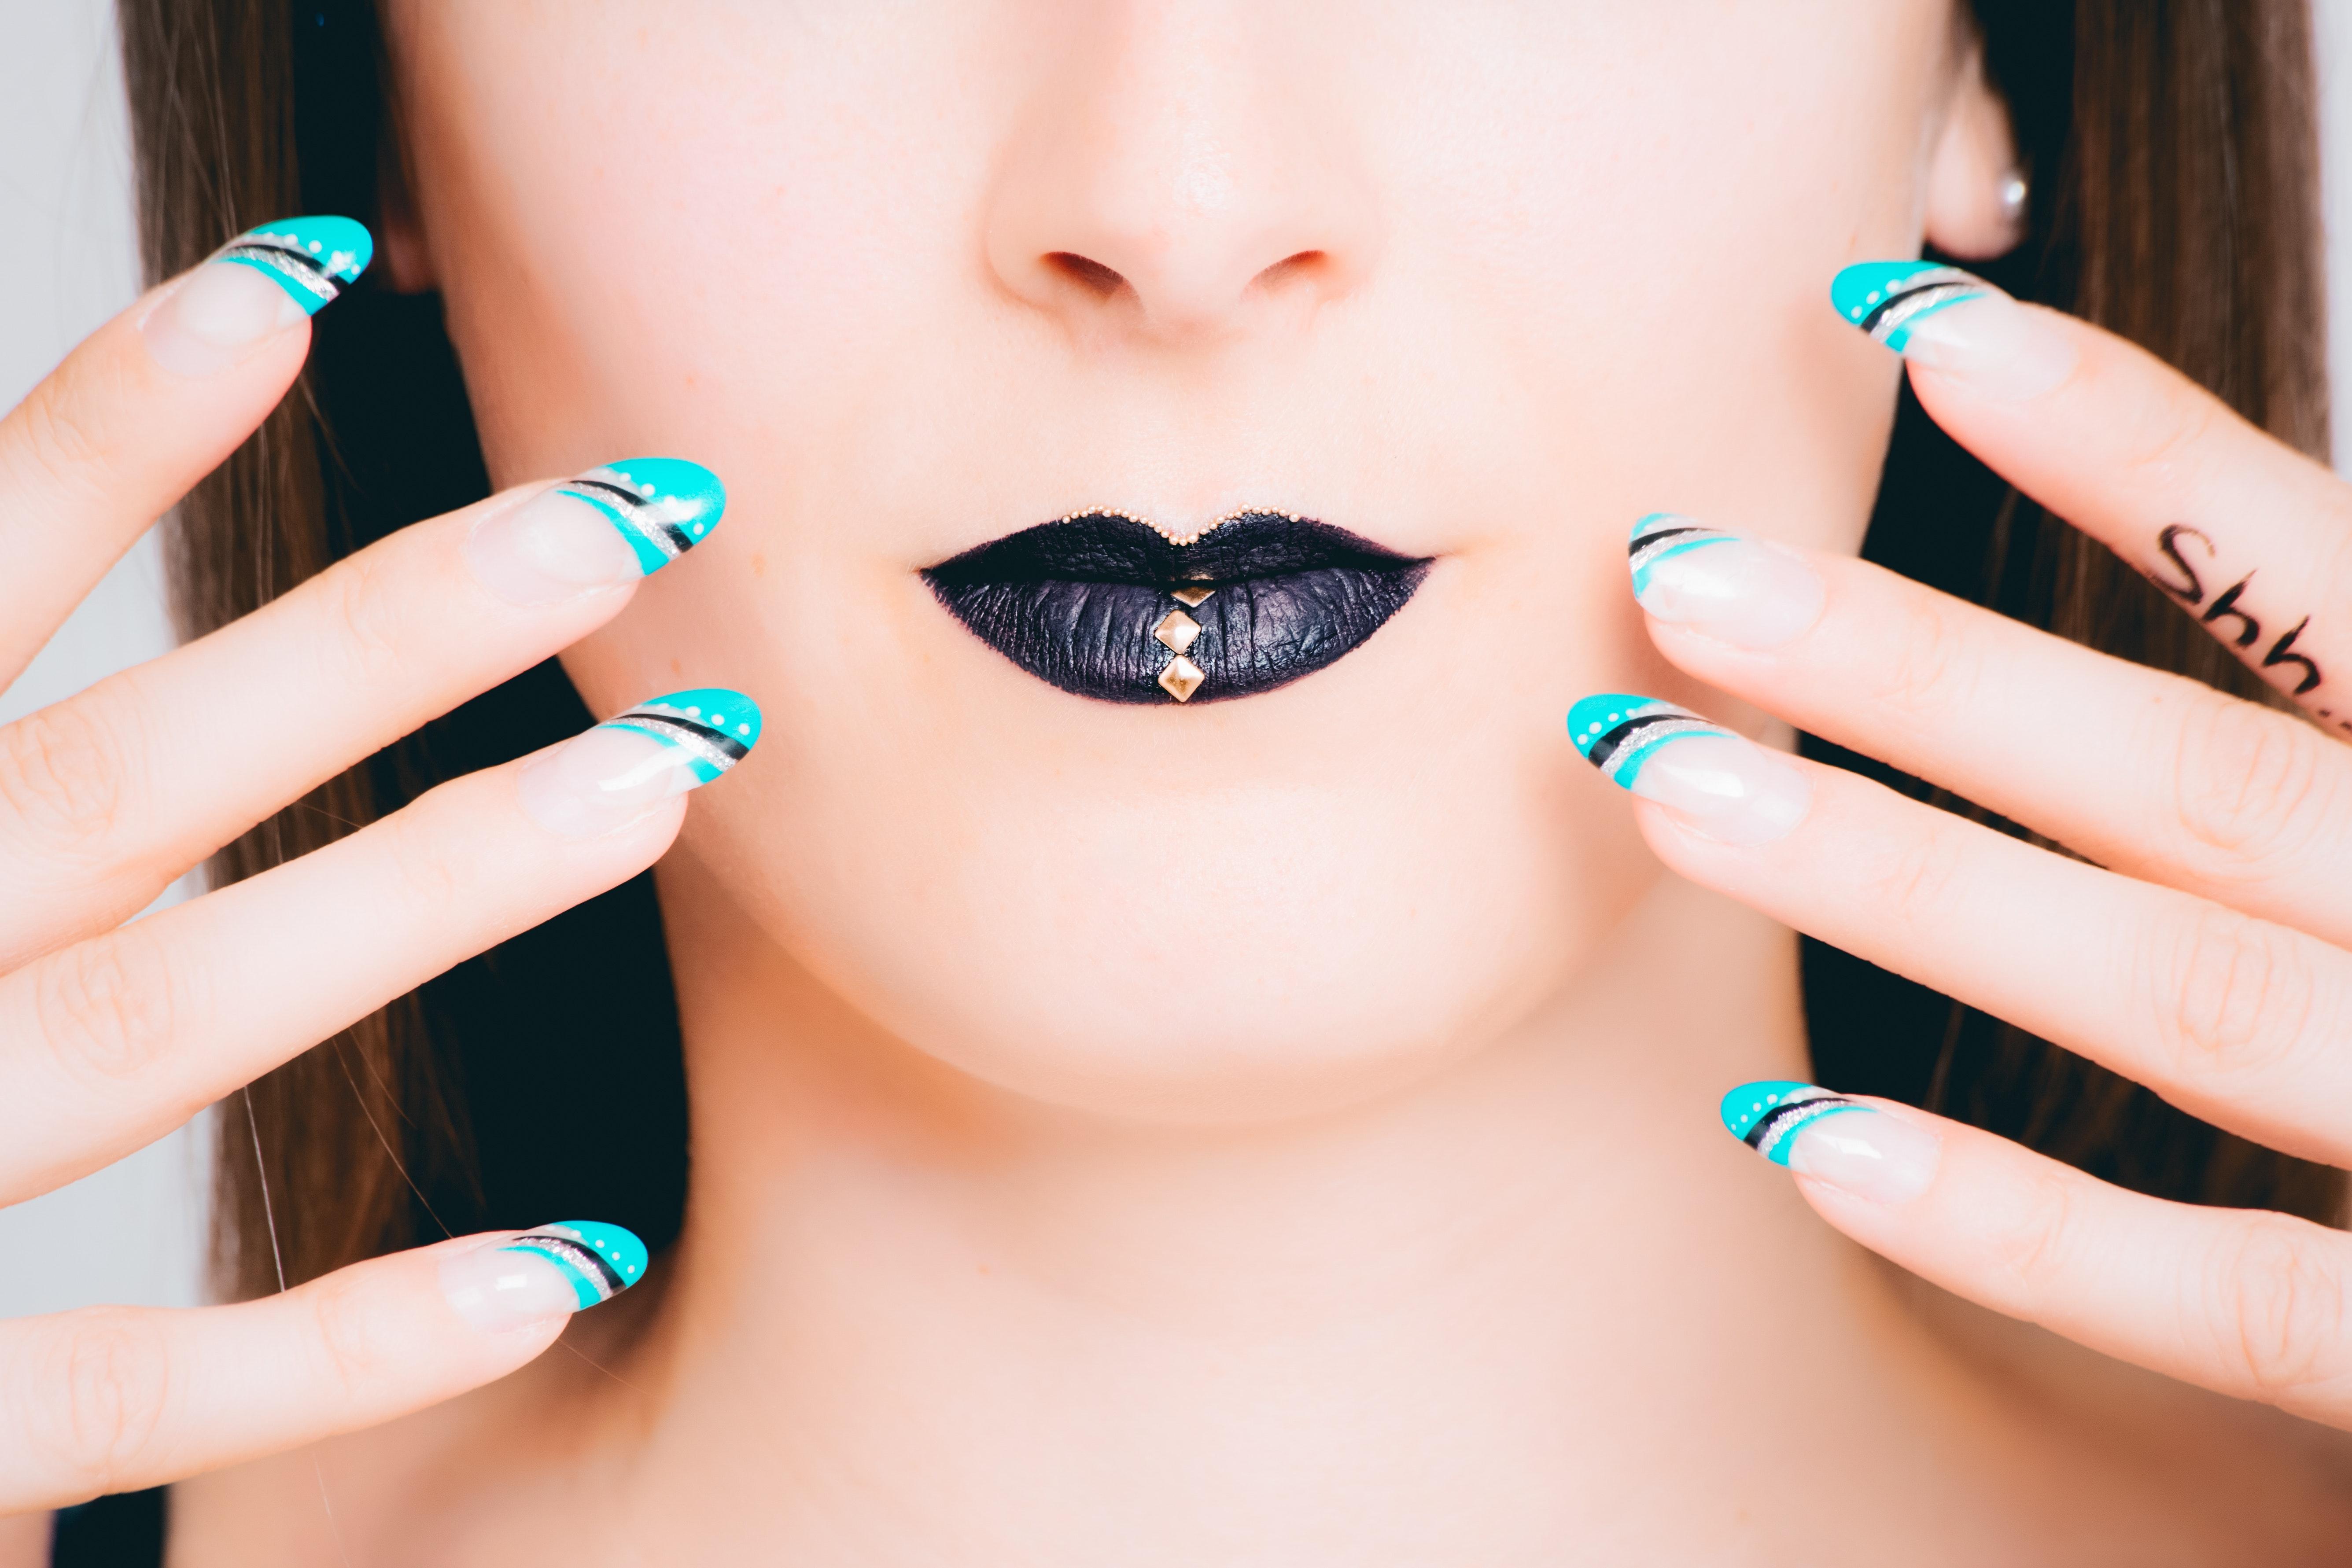 Teal, black, and white nail art photo